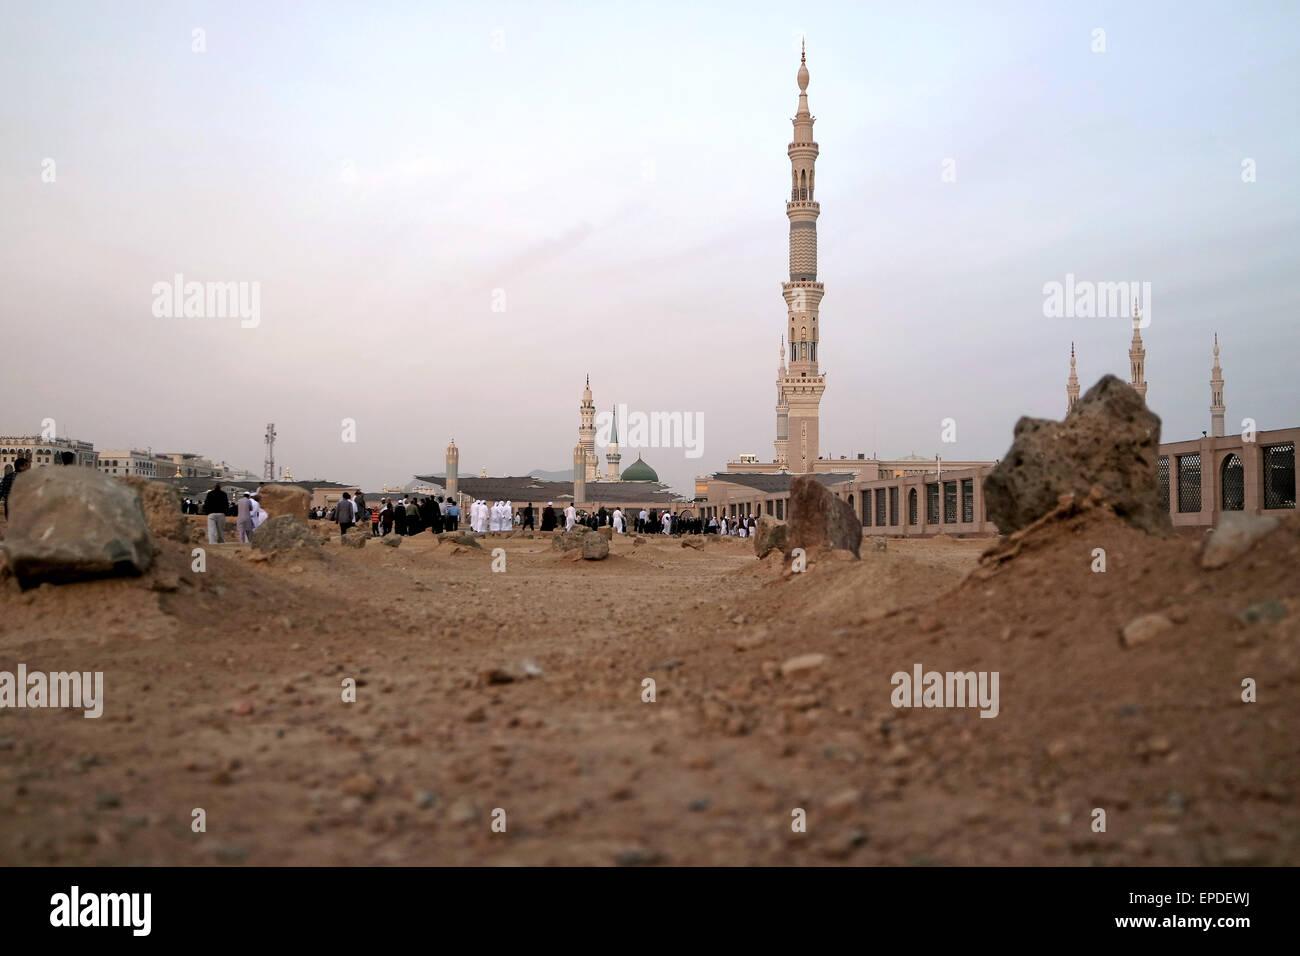 View of Baqee' Muslim cemetary at Masjid (mosque) Nabawi in Al Madinah, Kingdom of Saudi Arabia. - Stock Image